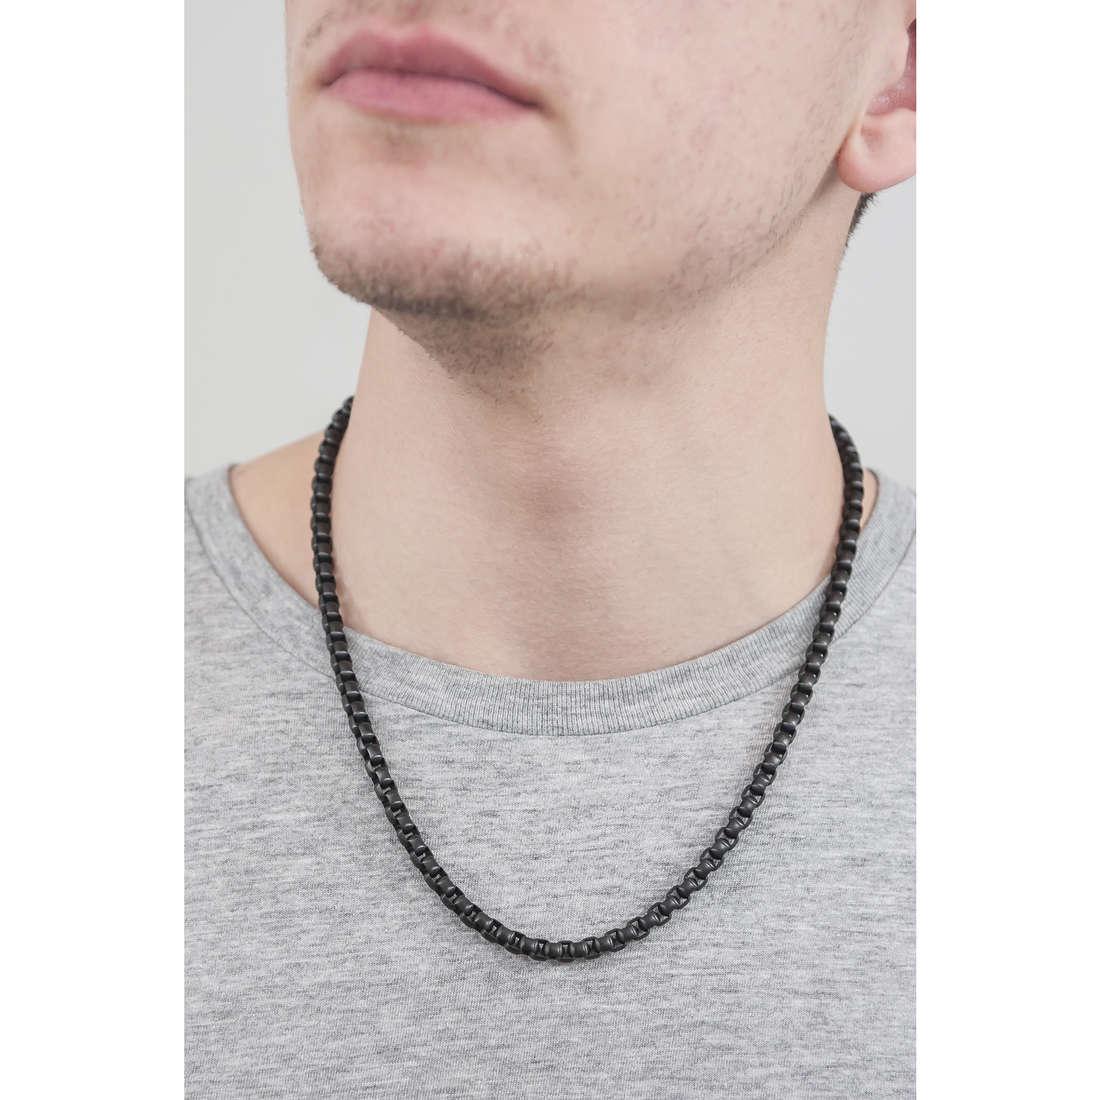 Police necklaces Battle man S14AGM01C indosso